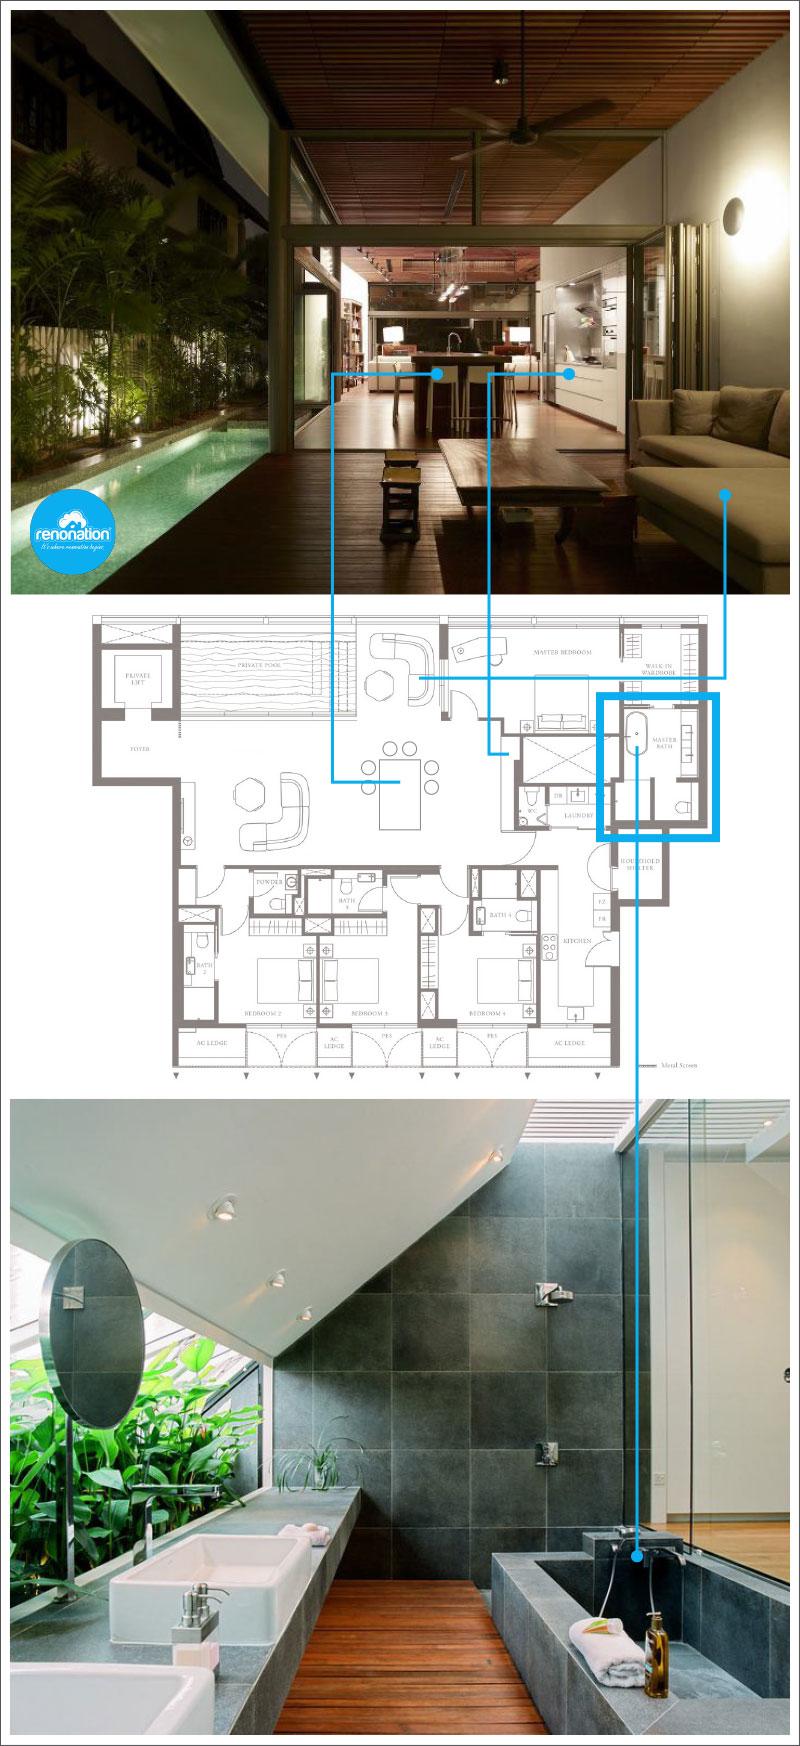 MEYERHOUSE - Designs: HYLA Architects